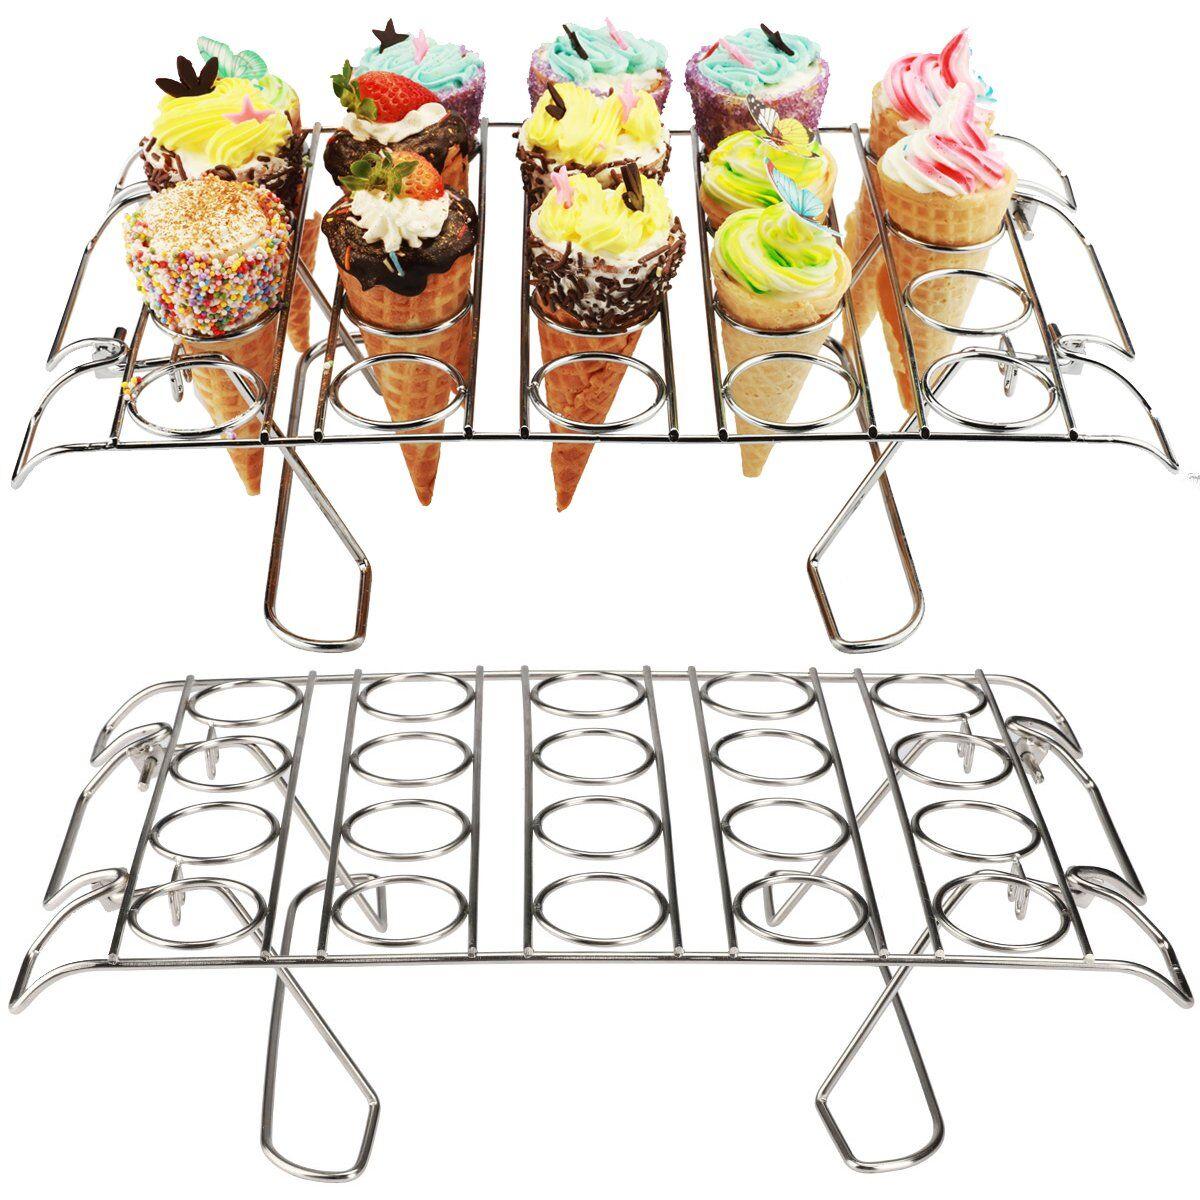 cupcake cone baking rack